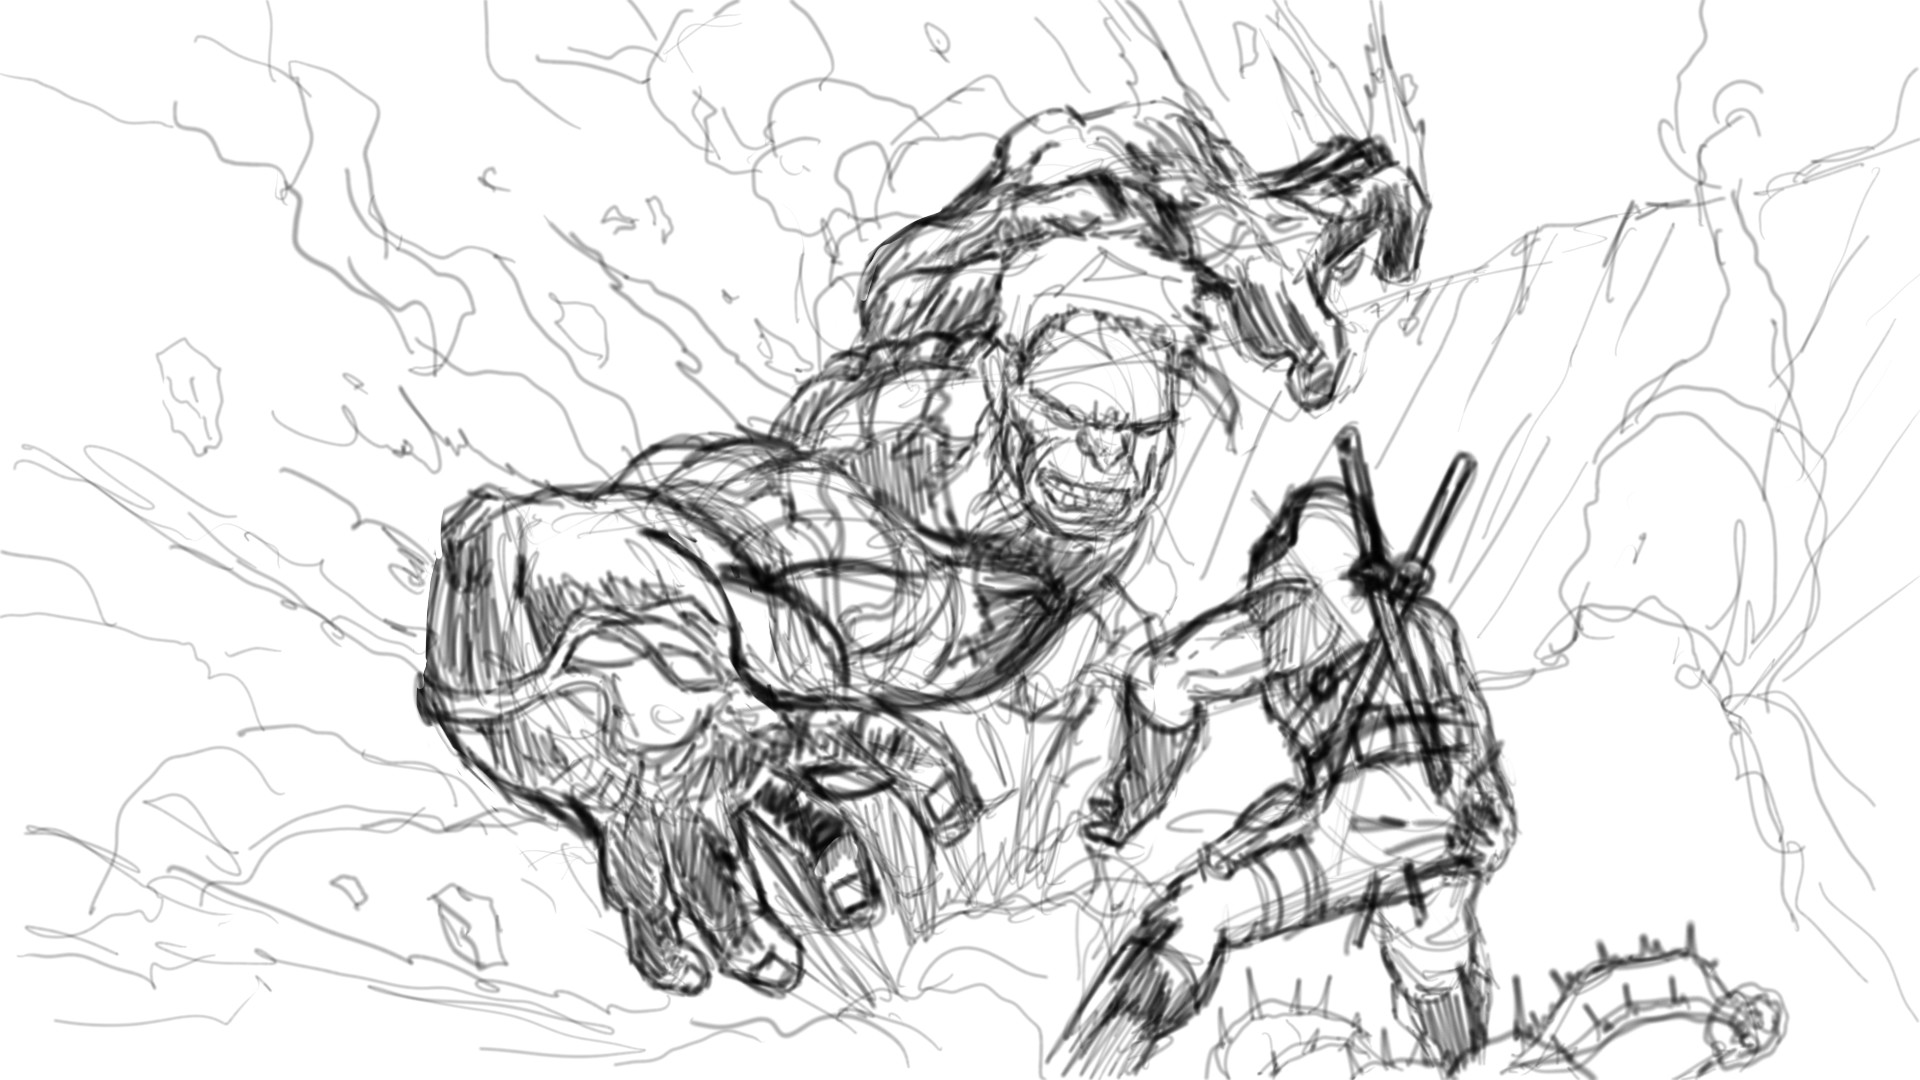 Dibujando A Hulk Vs Deadpool (Parte 1)/ Drawing Hulk Vs Deadpool (Part 1)